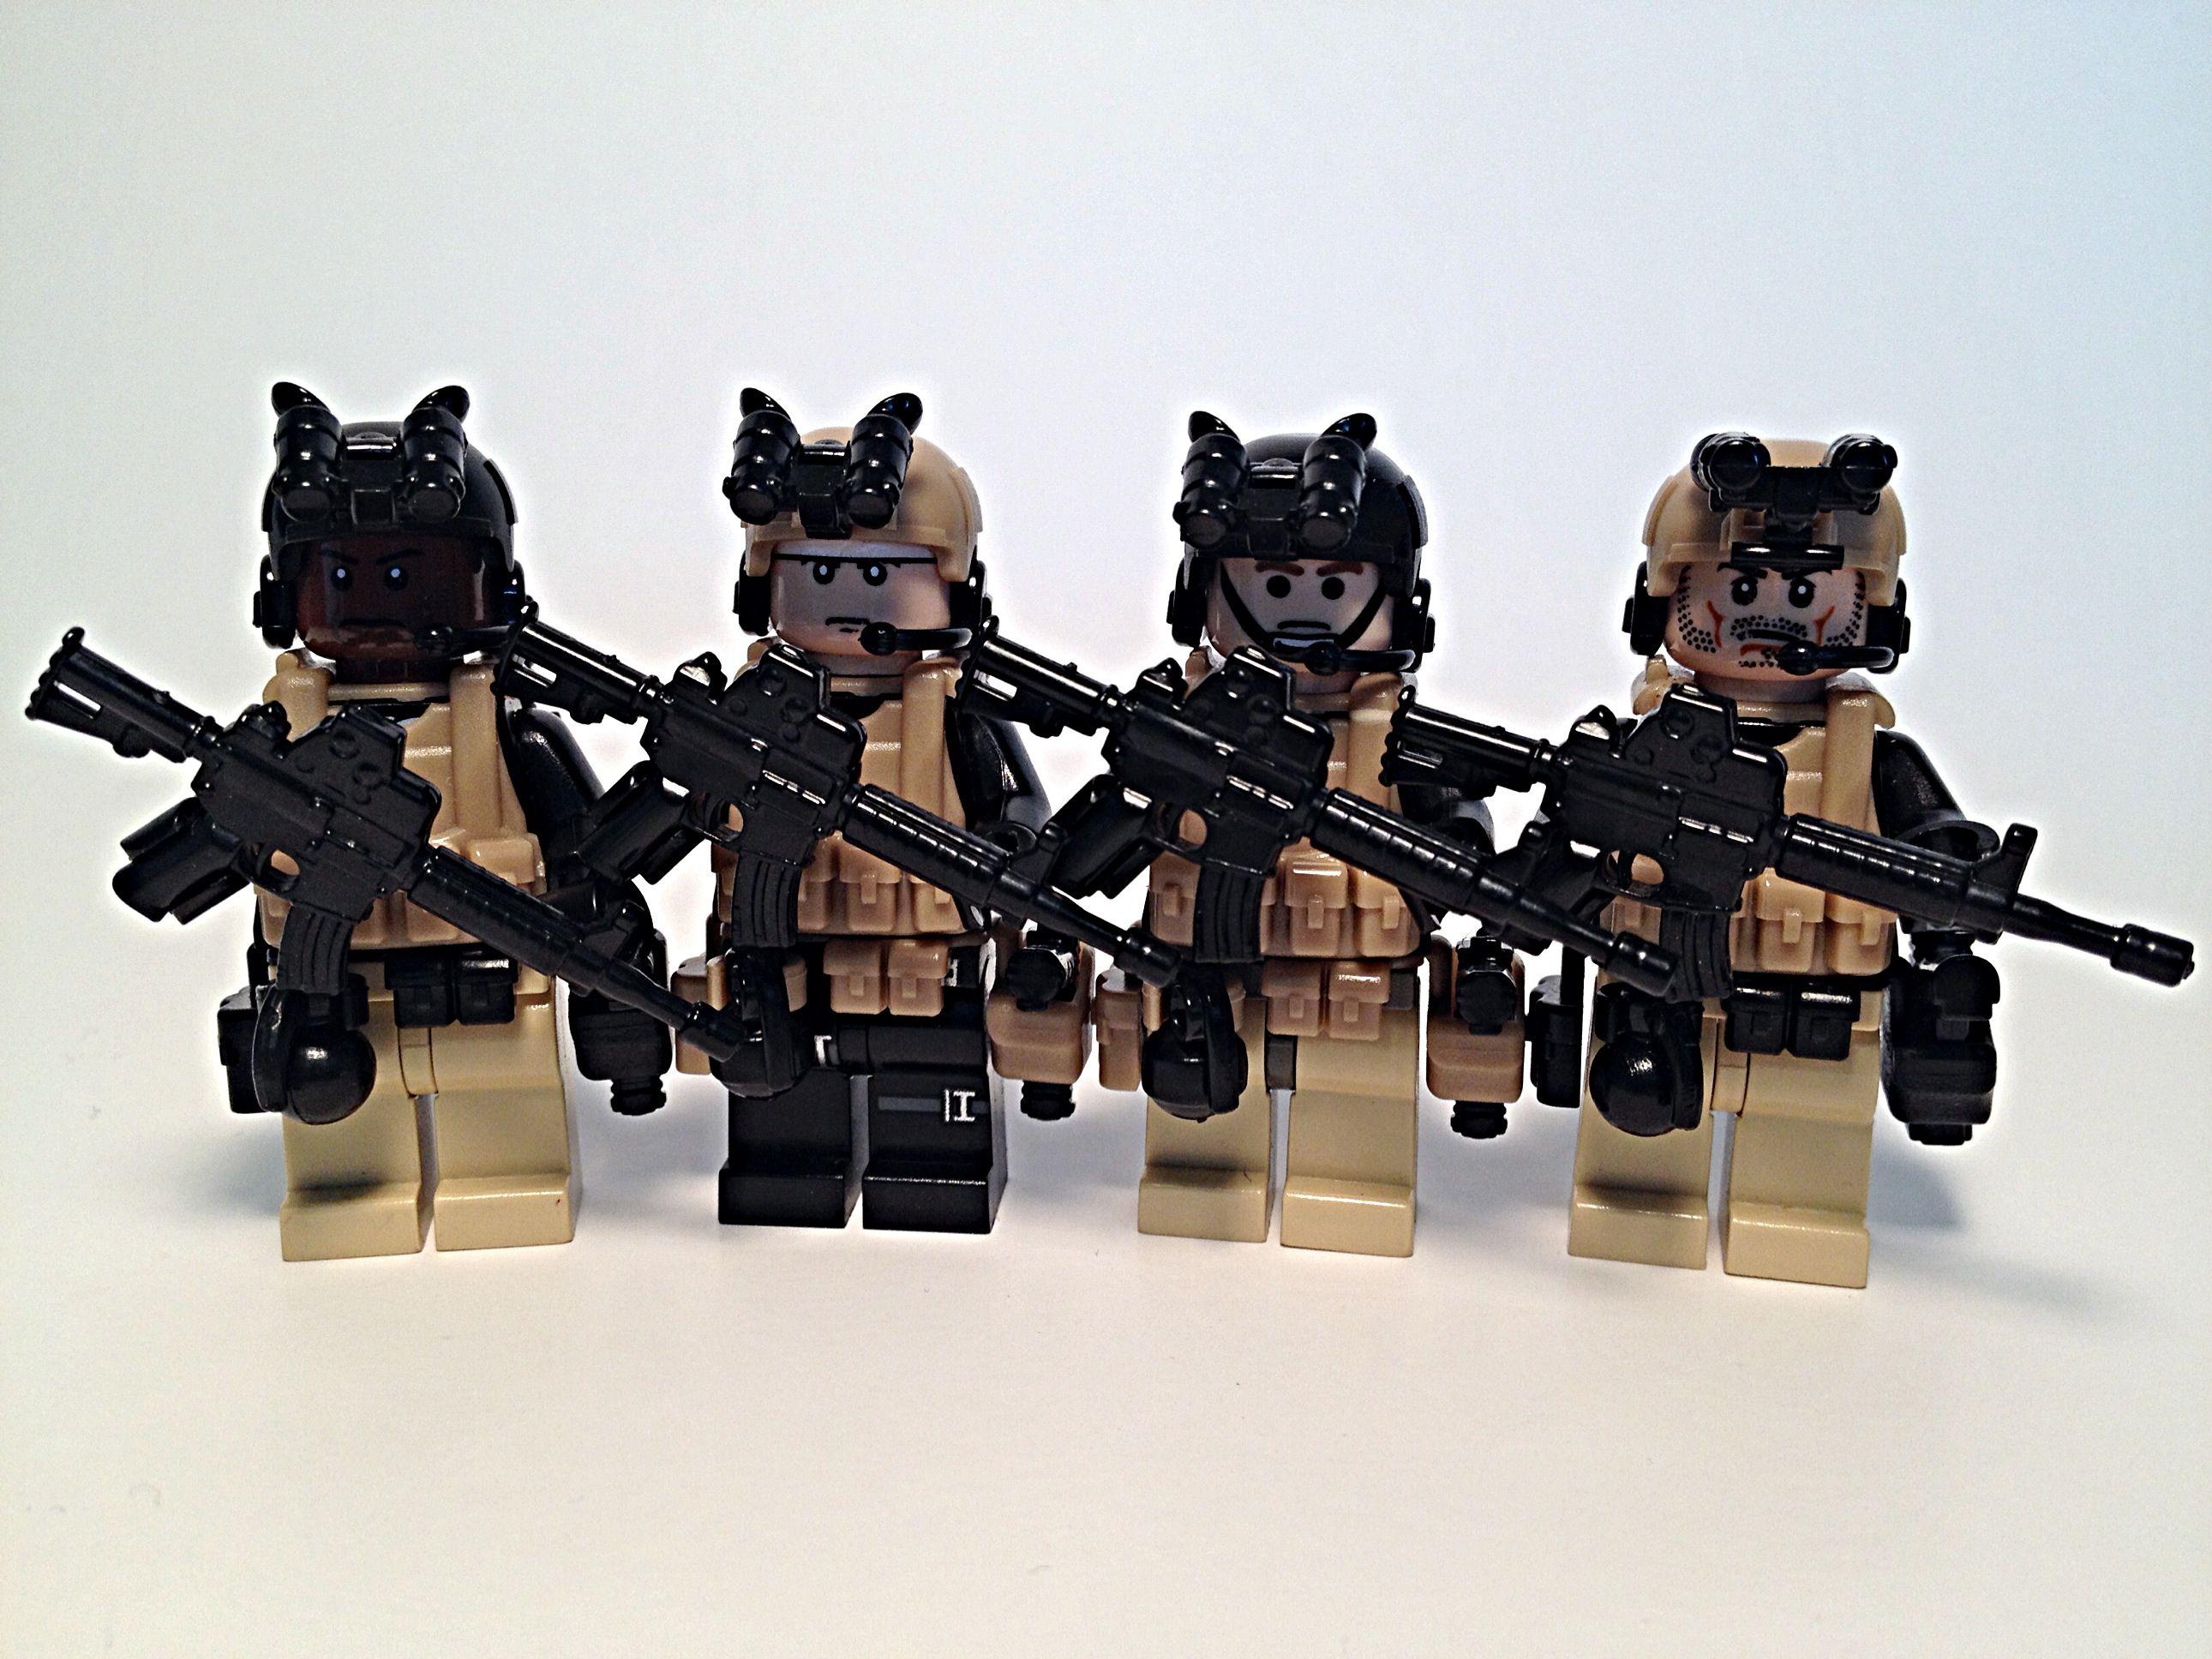 Lego Navy SEAL Team 6